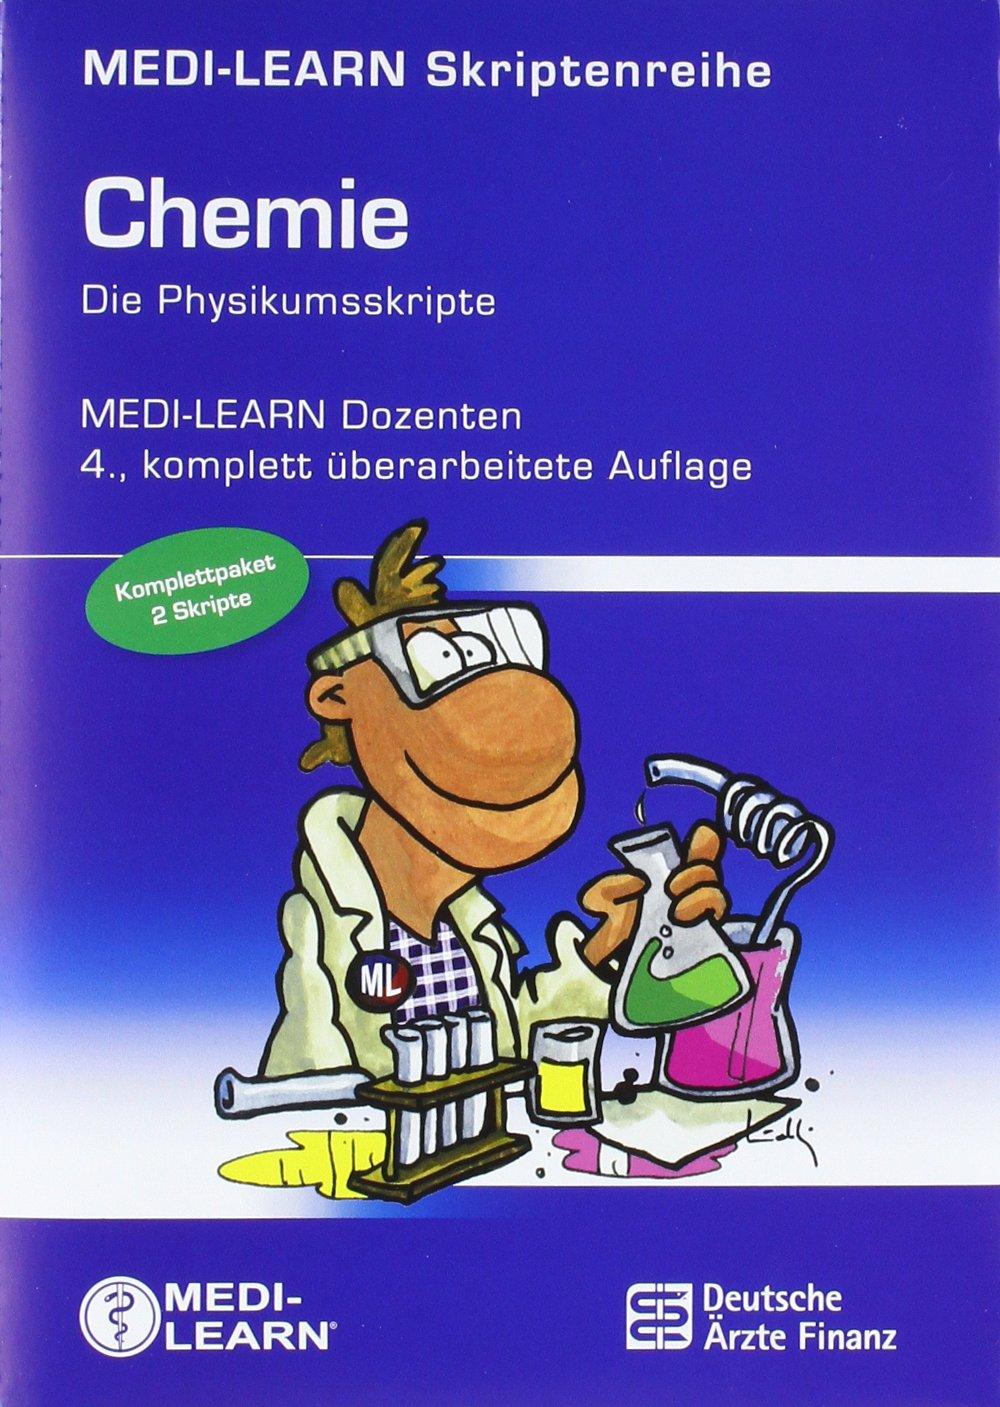 MEDI-LEARN: Chemie 1 + 2 – Die Physikumsskripte